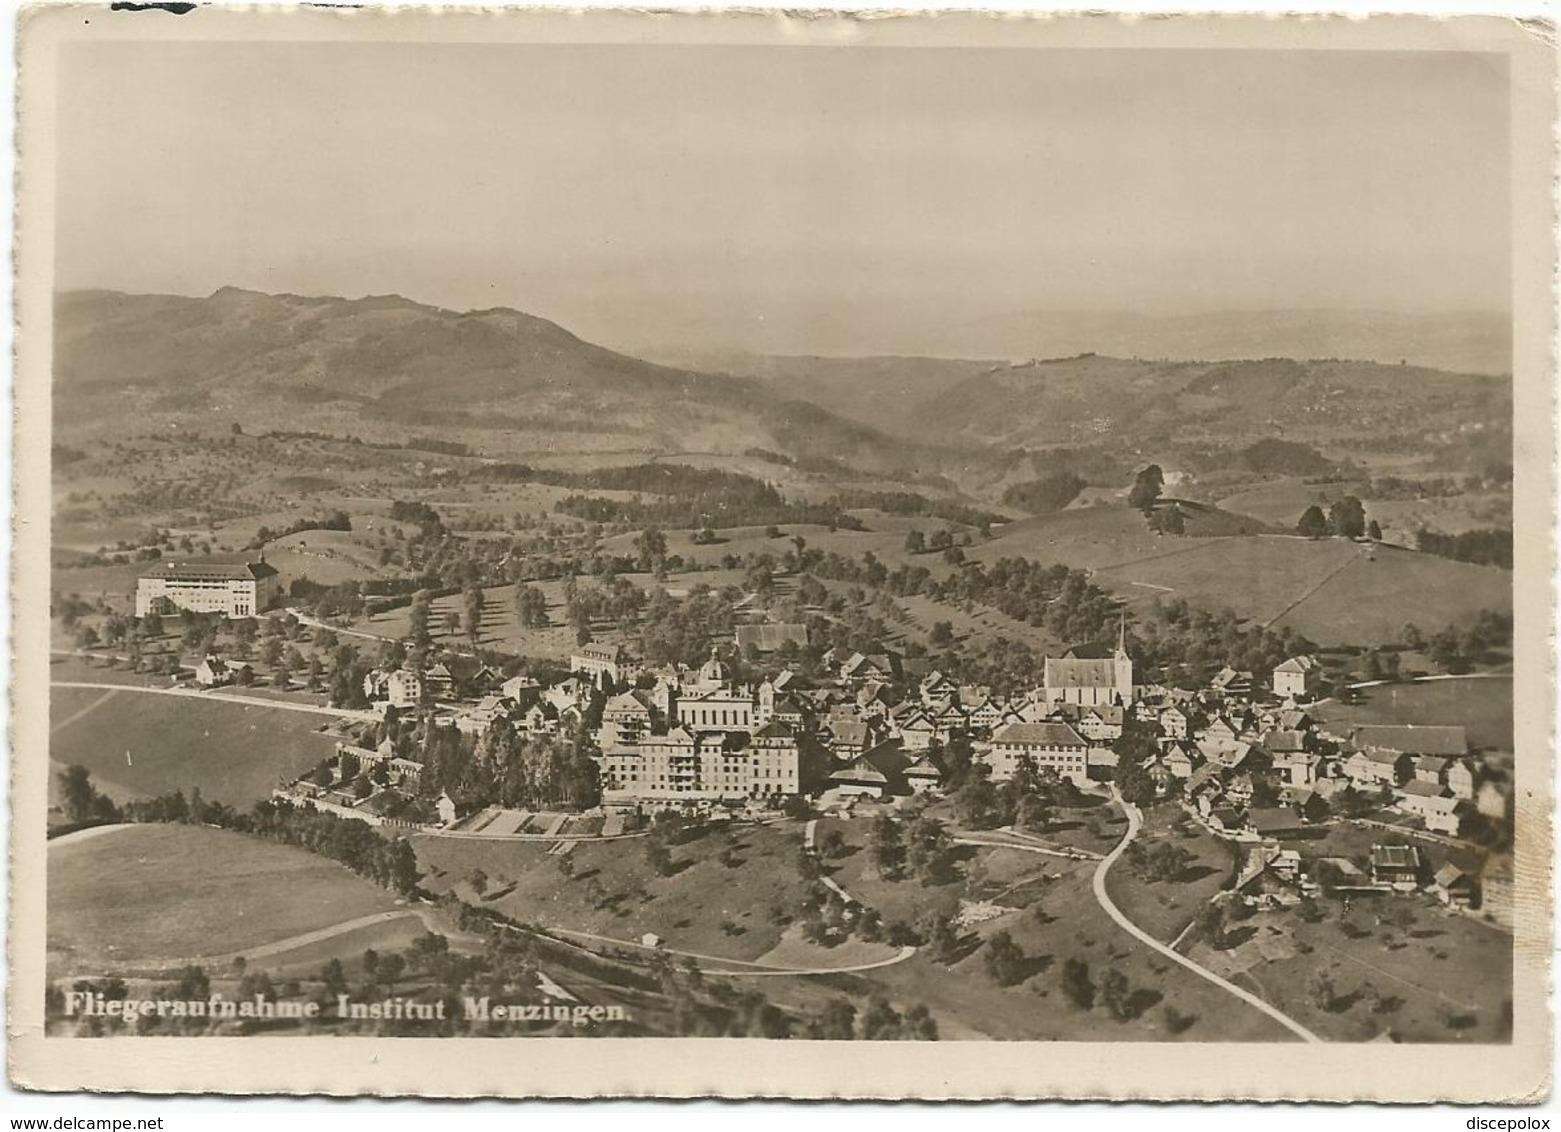 W4679 Fliegeraufnahme Institut Menzingen / Viaggiata 1951 - ZG Zoug